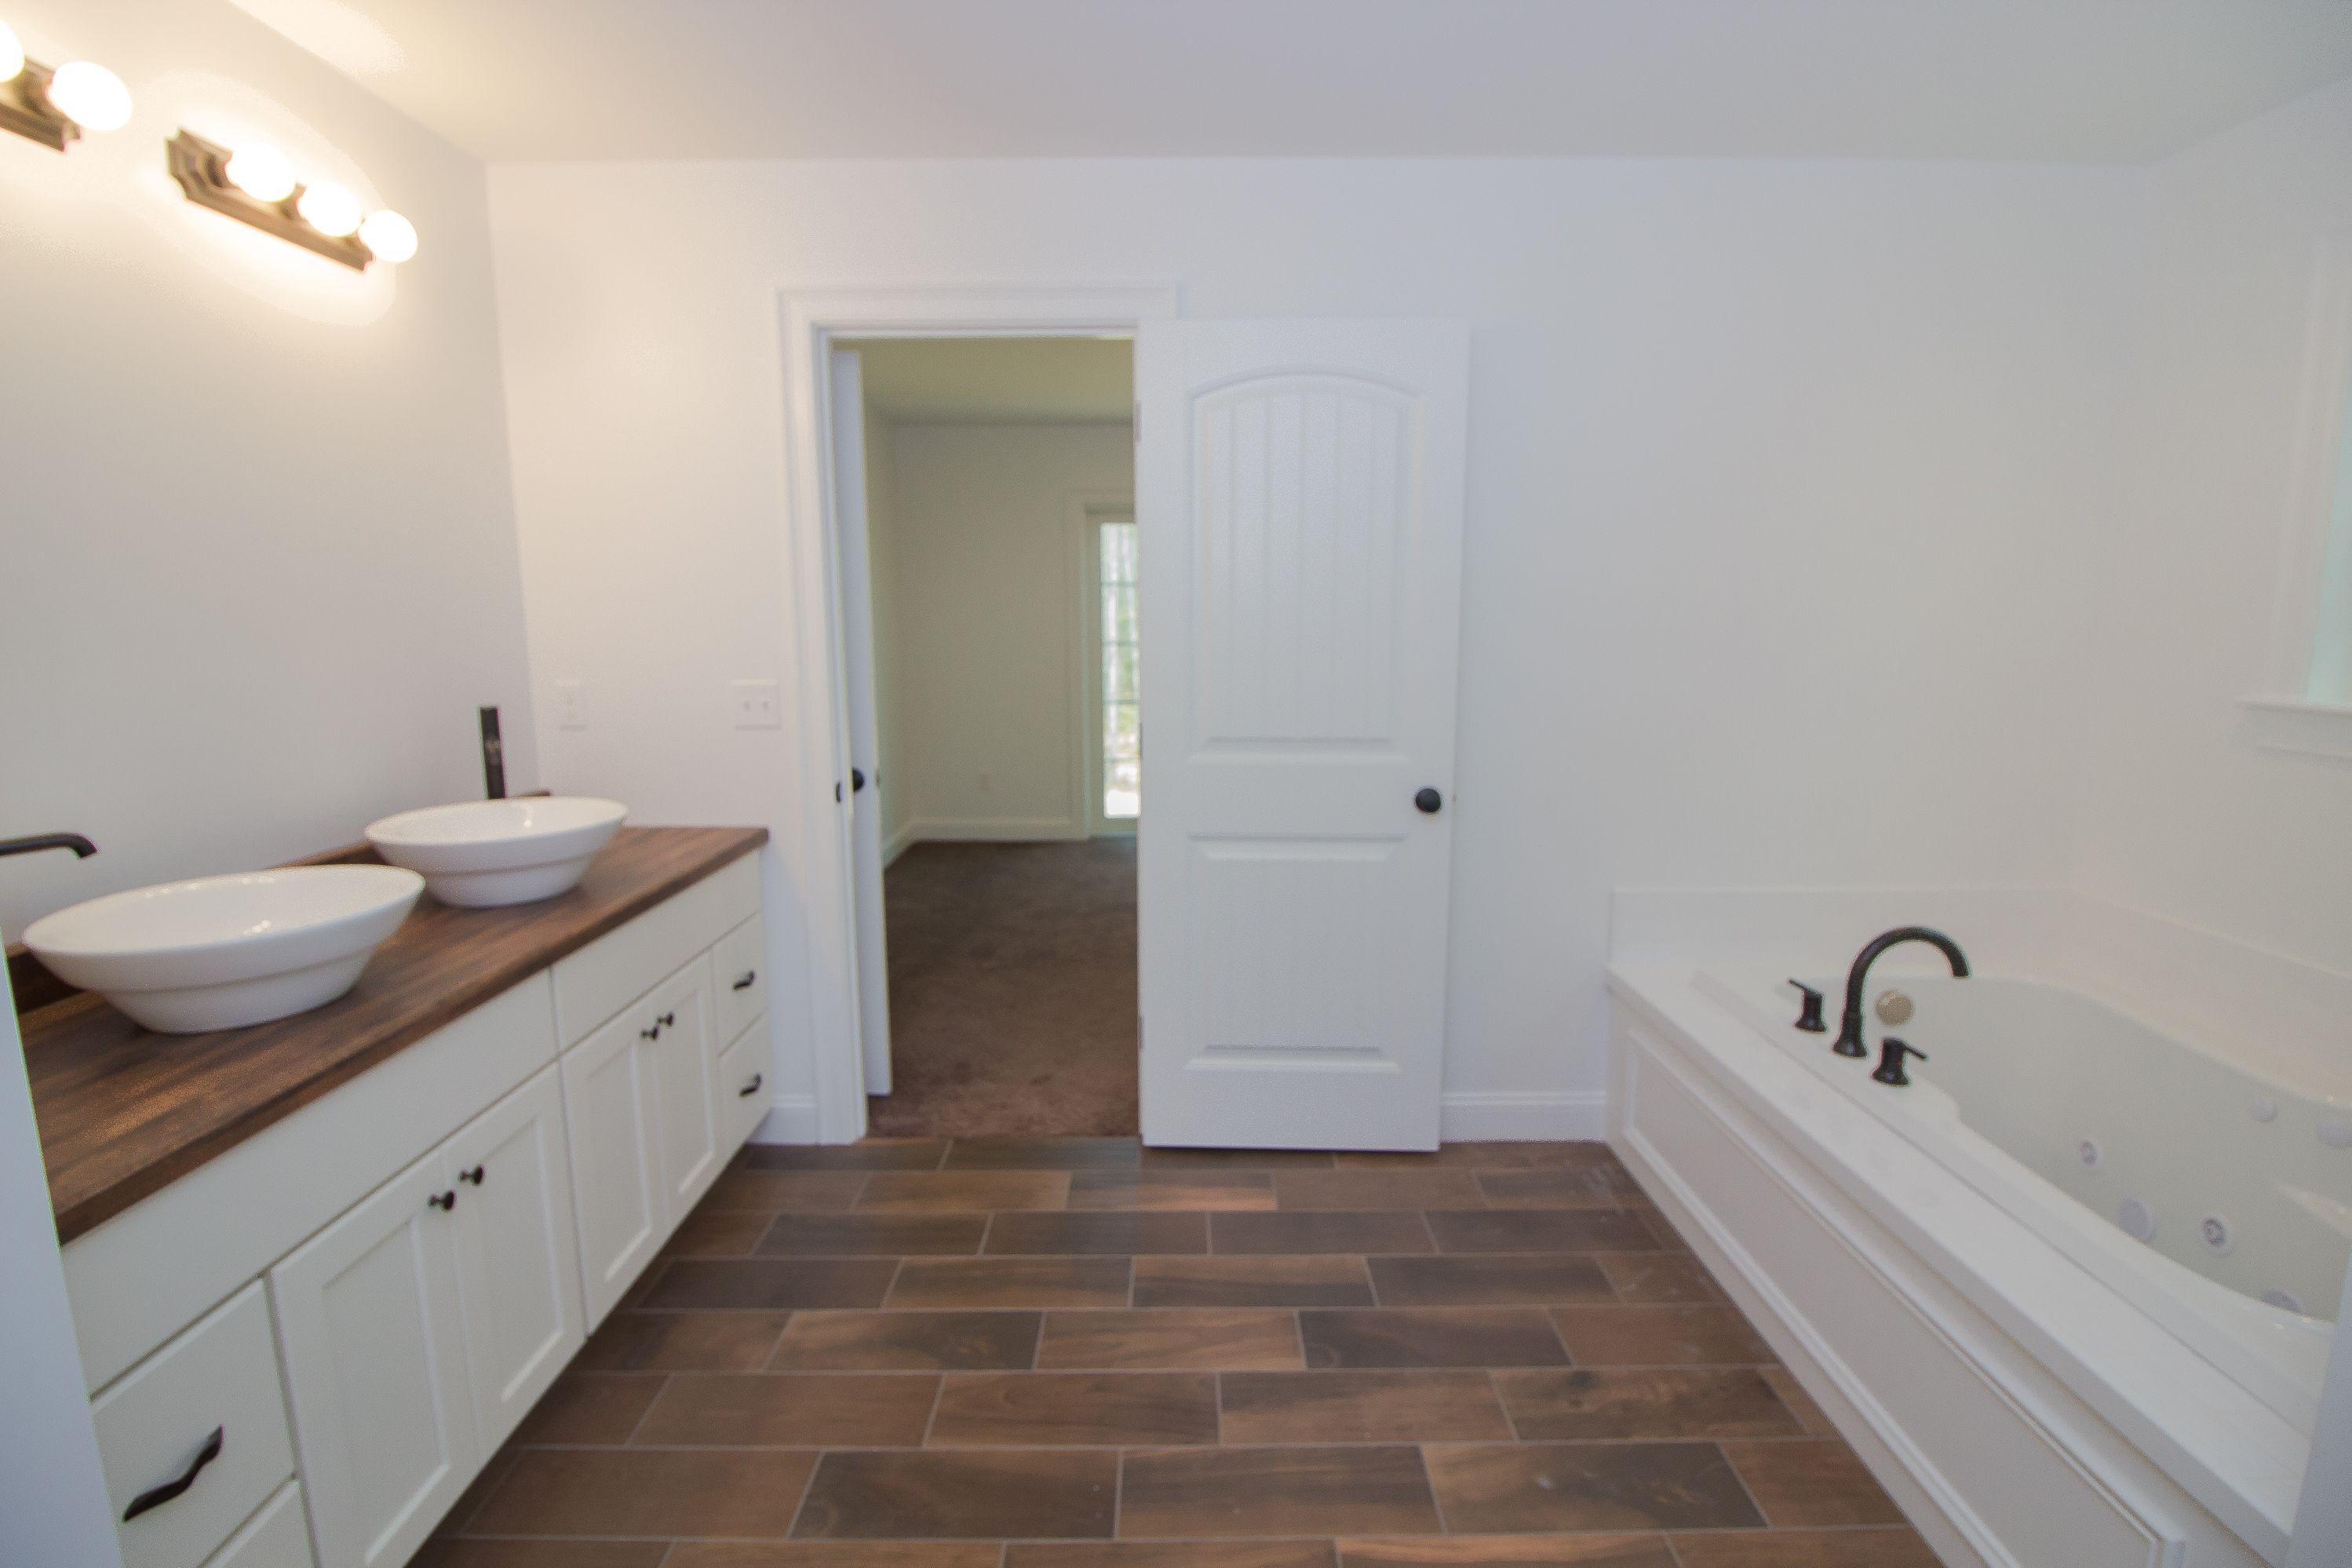 WwwCCHFIcom Chase Custom Homes Finance Maine New Home - Bathroom remodel portland maine